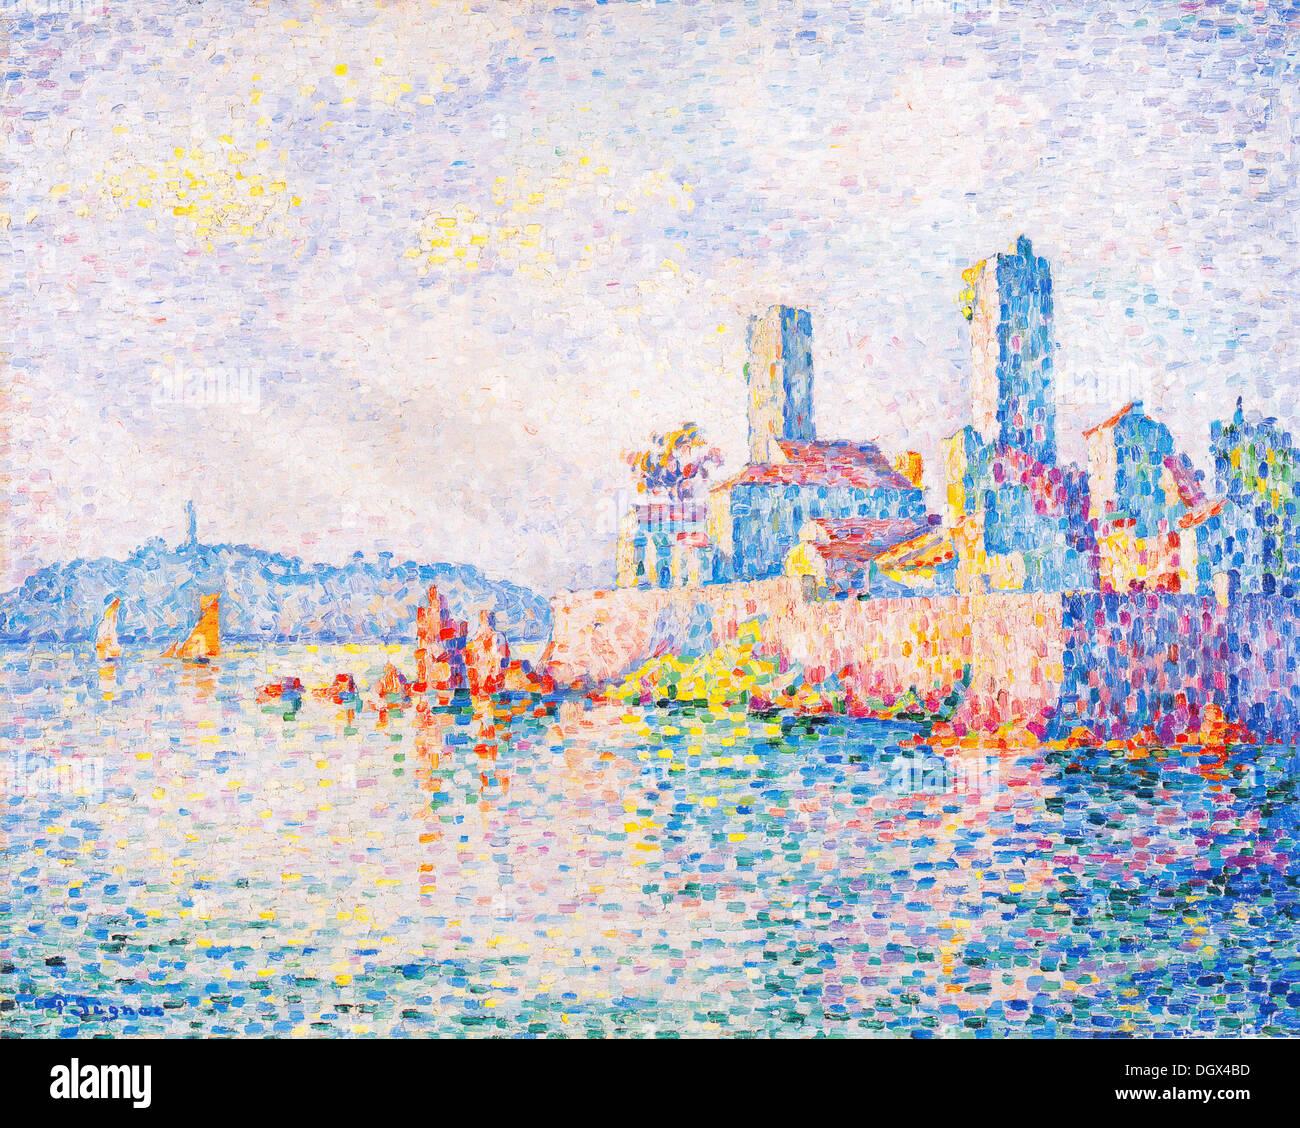 Antibes, Le Torri - da Paul Signac, 1911 Immagini Stock